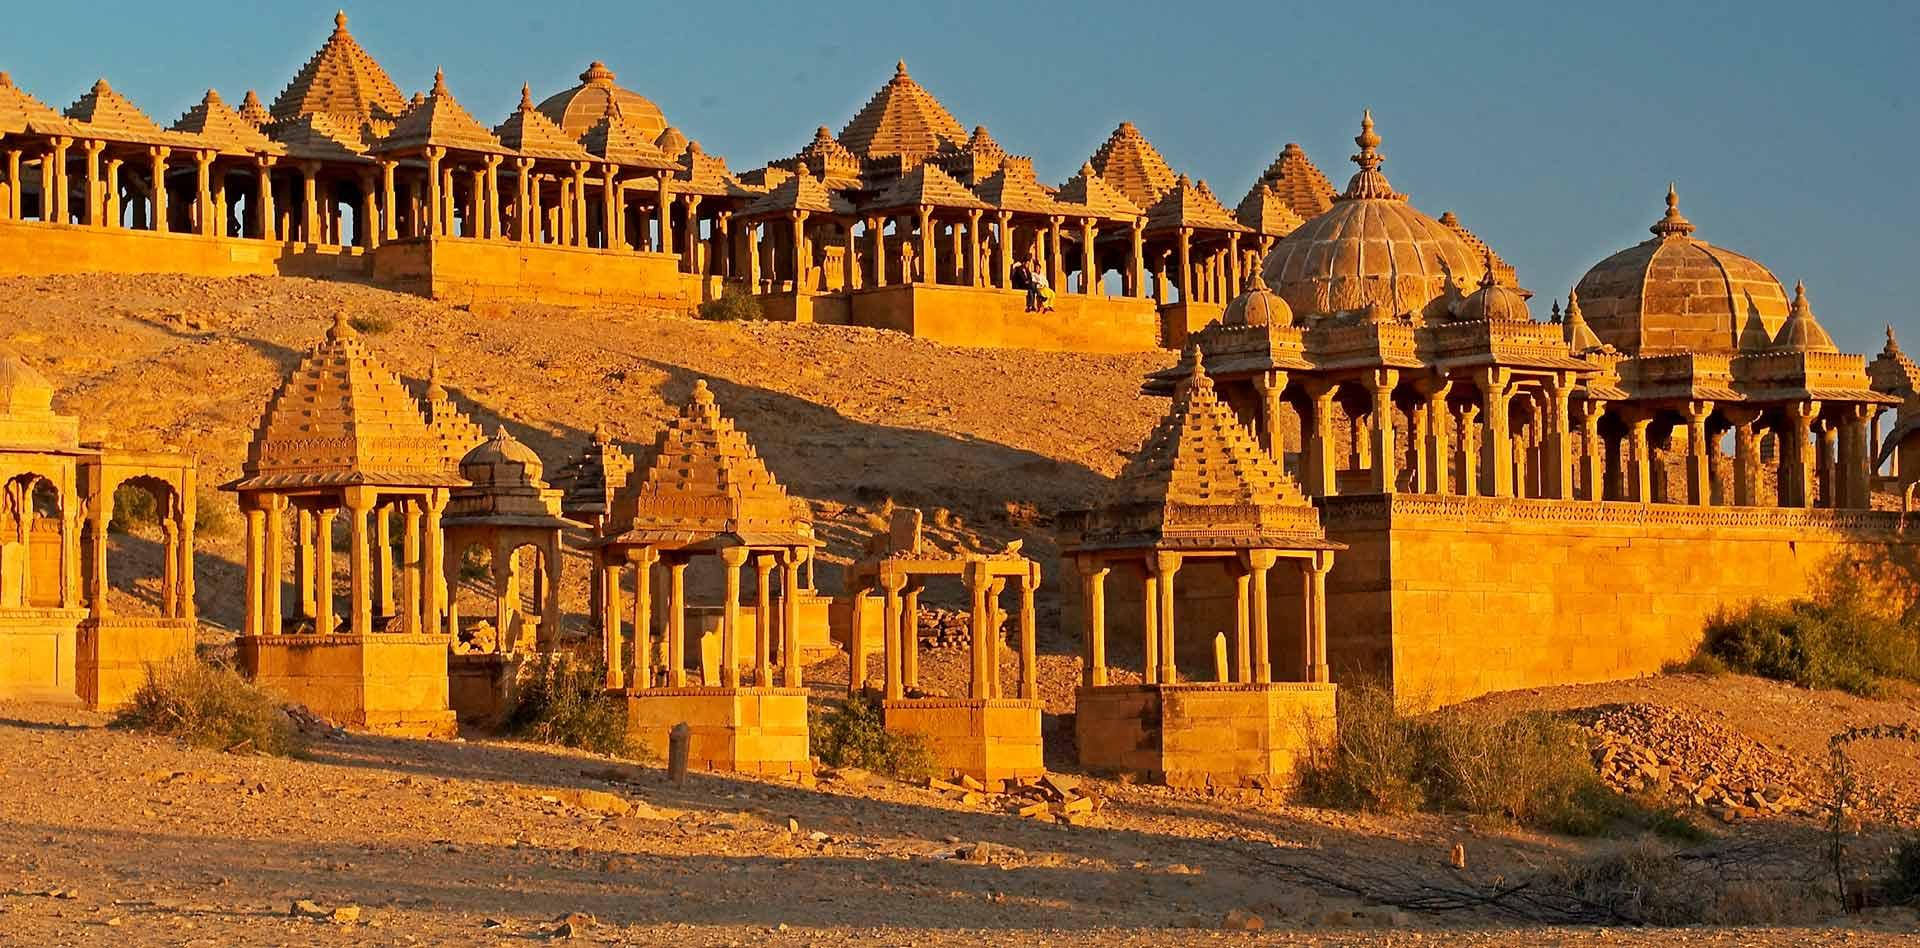 Bada-Bagh Jaisalmer